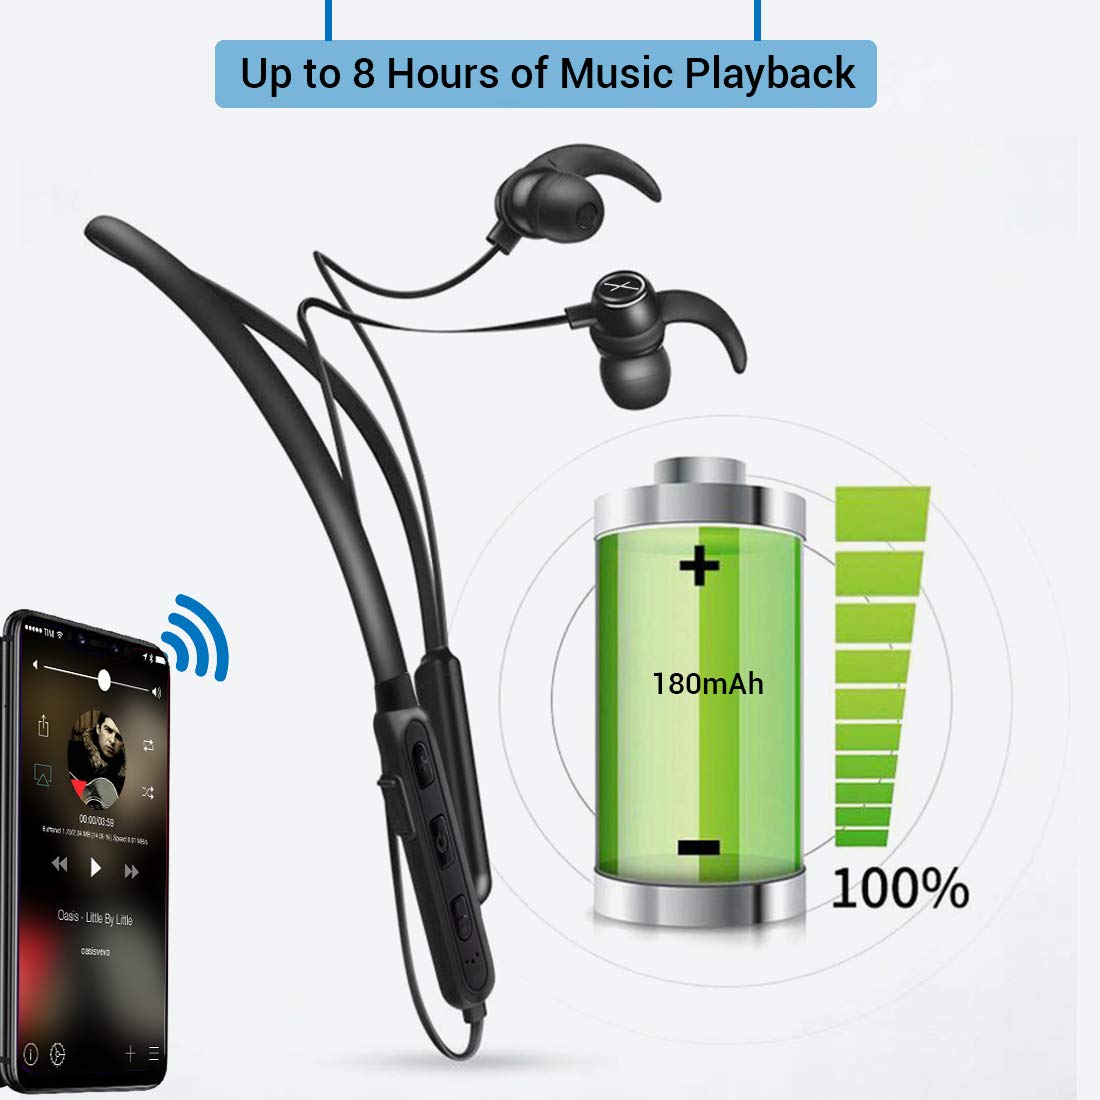 Xmate Mana in-Ear Wireless Bluetooth Headphones